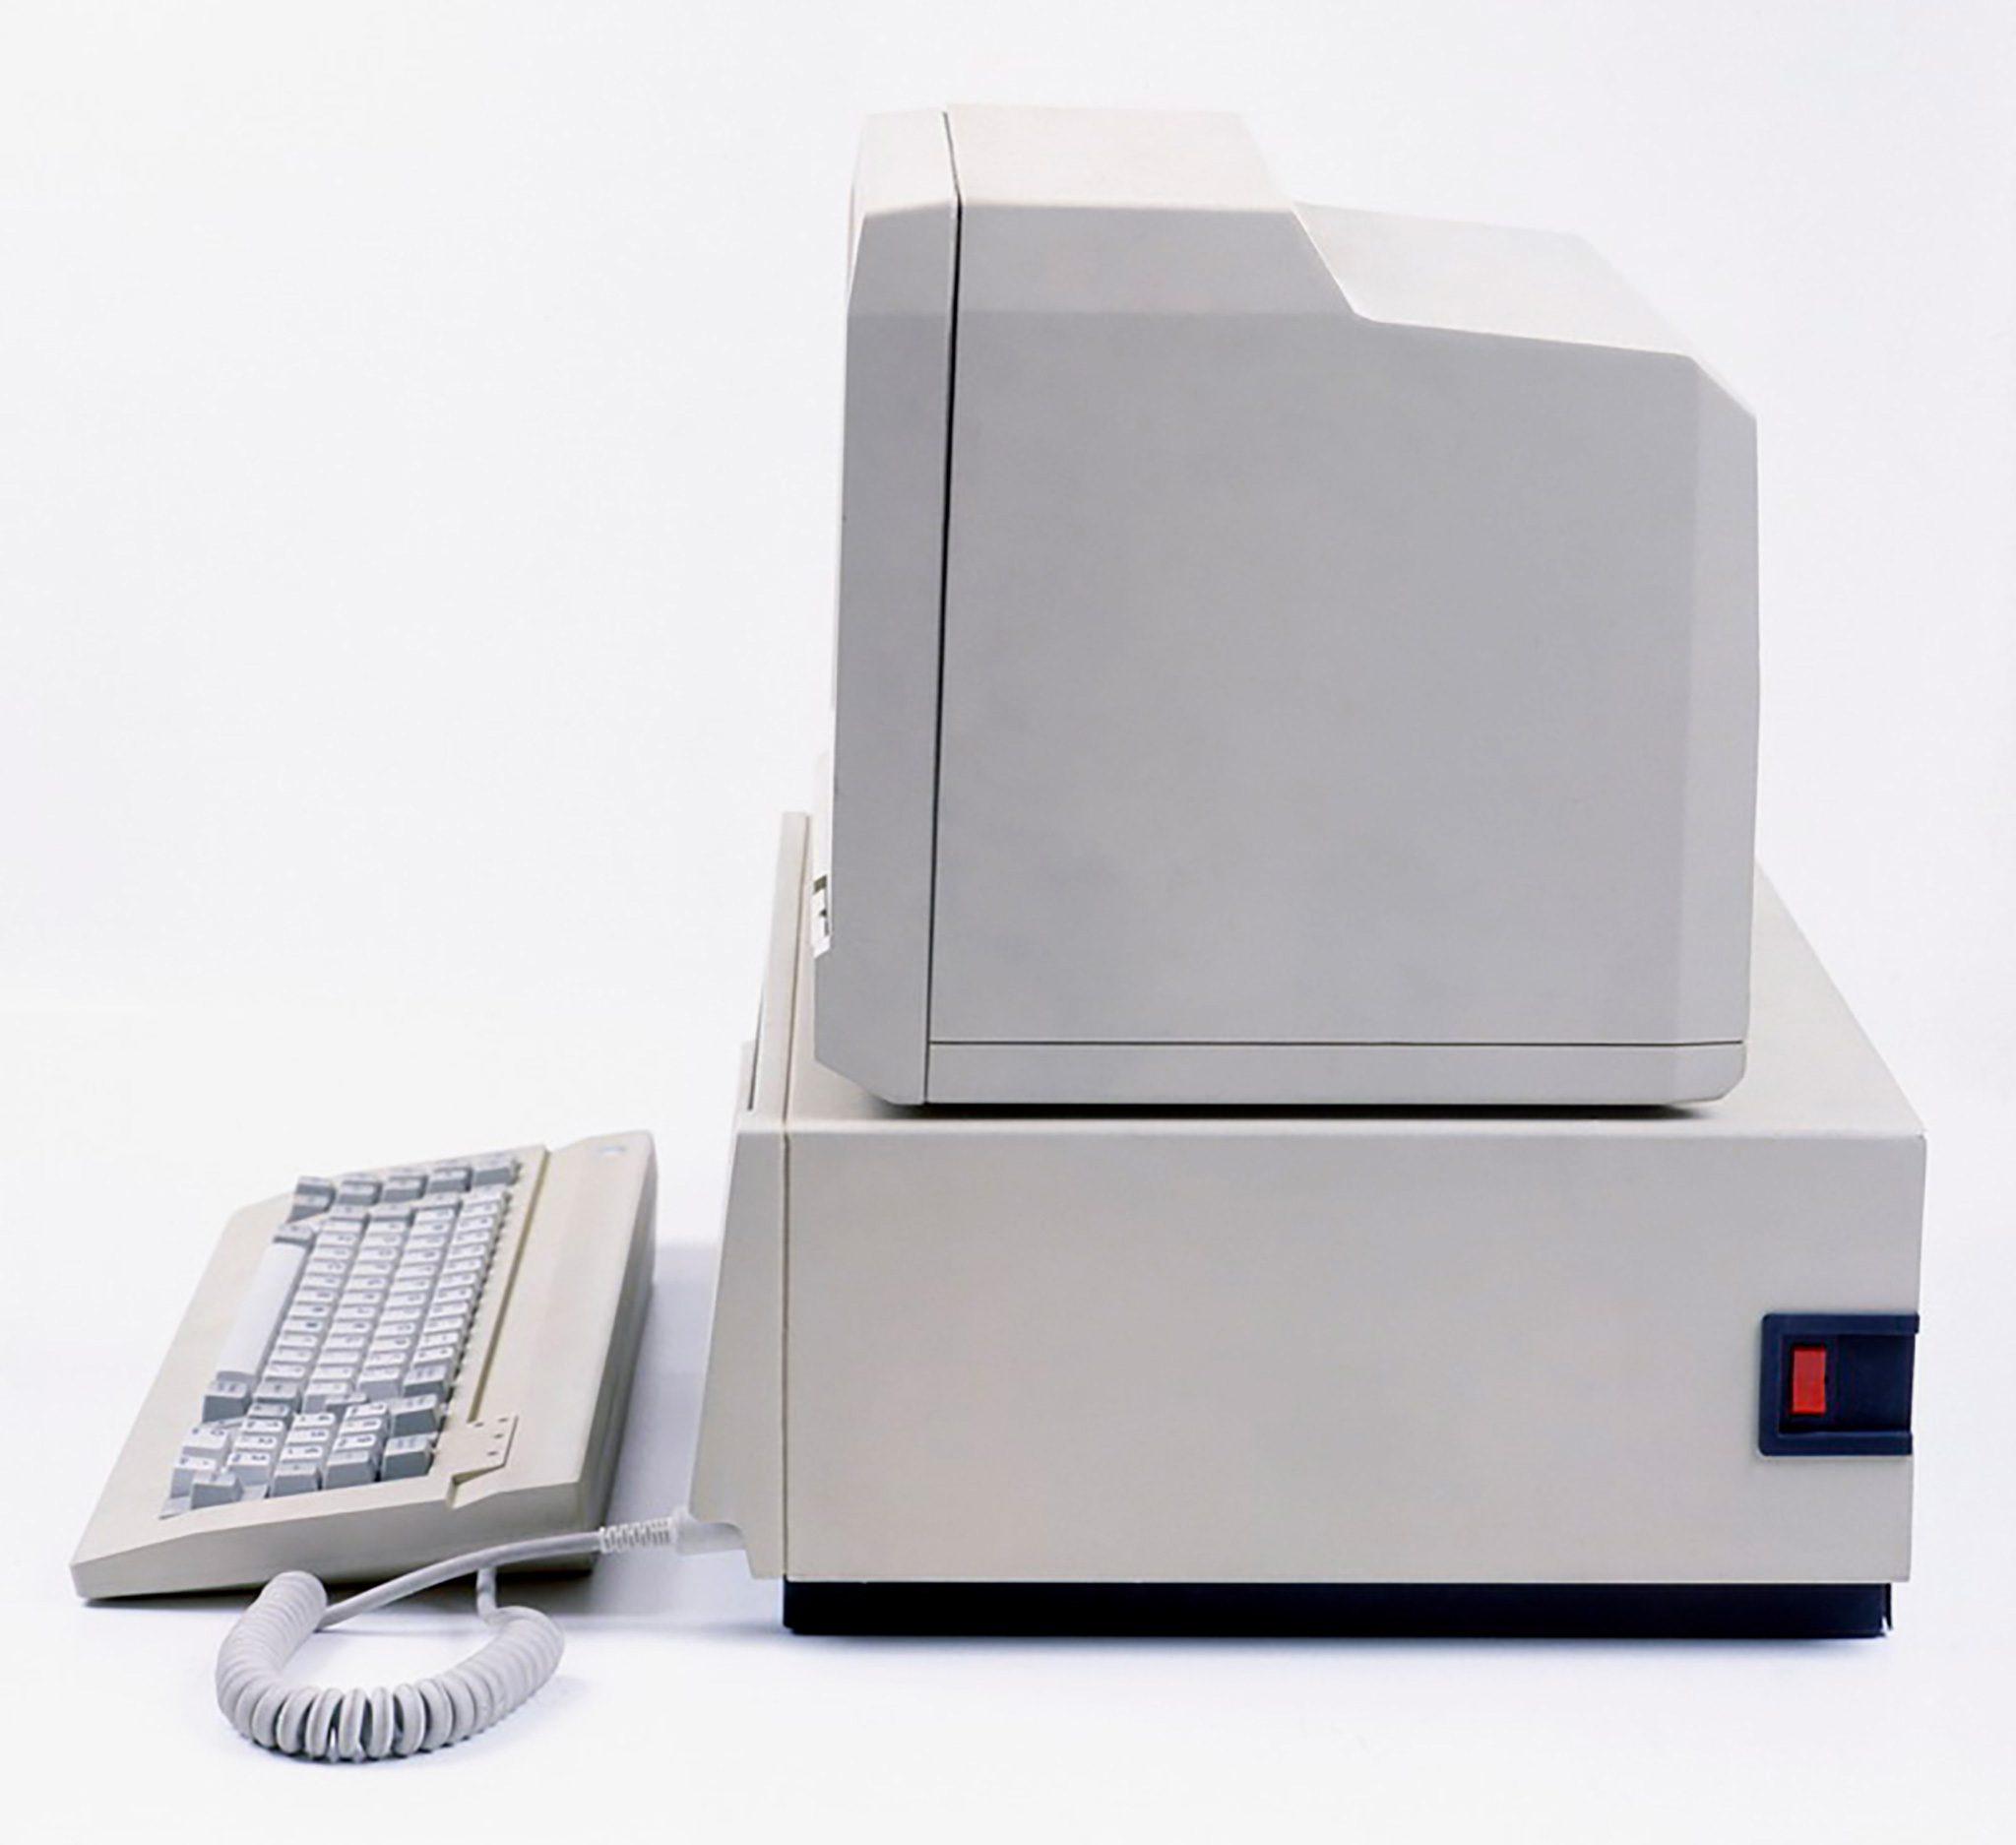 Prototyp mikrokomputera Mazovia 1016, widok zboku